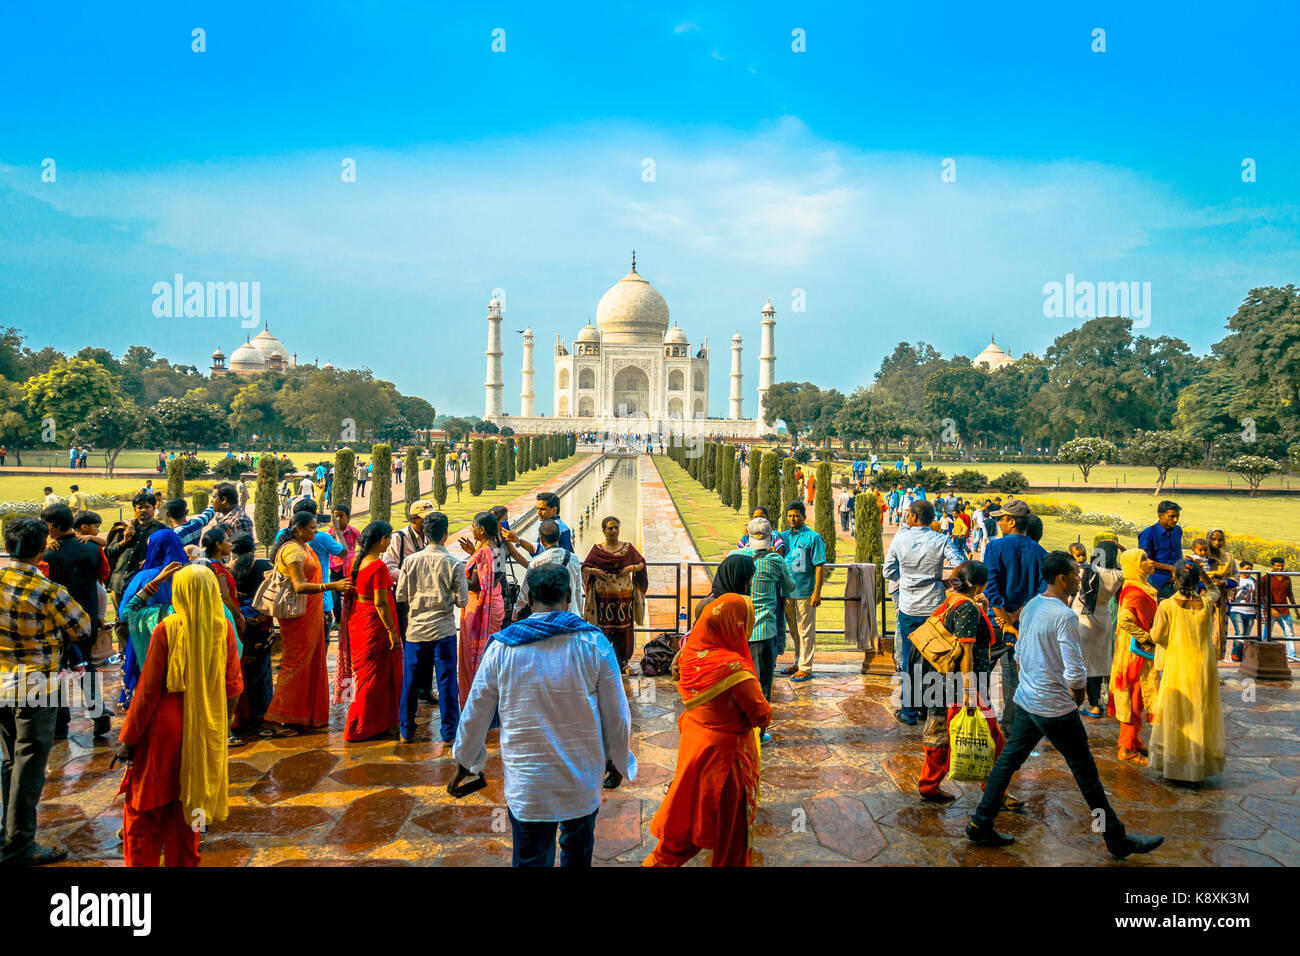 Agra, India - September 20, 2017: Unidentified people walking and enjoying the beautiful Taj Mahal, is an ivory - Stock Image